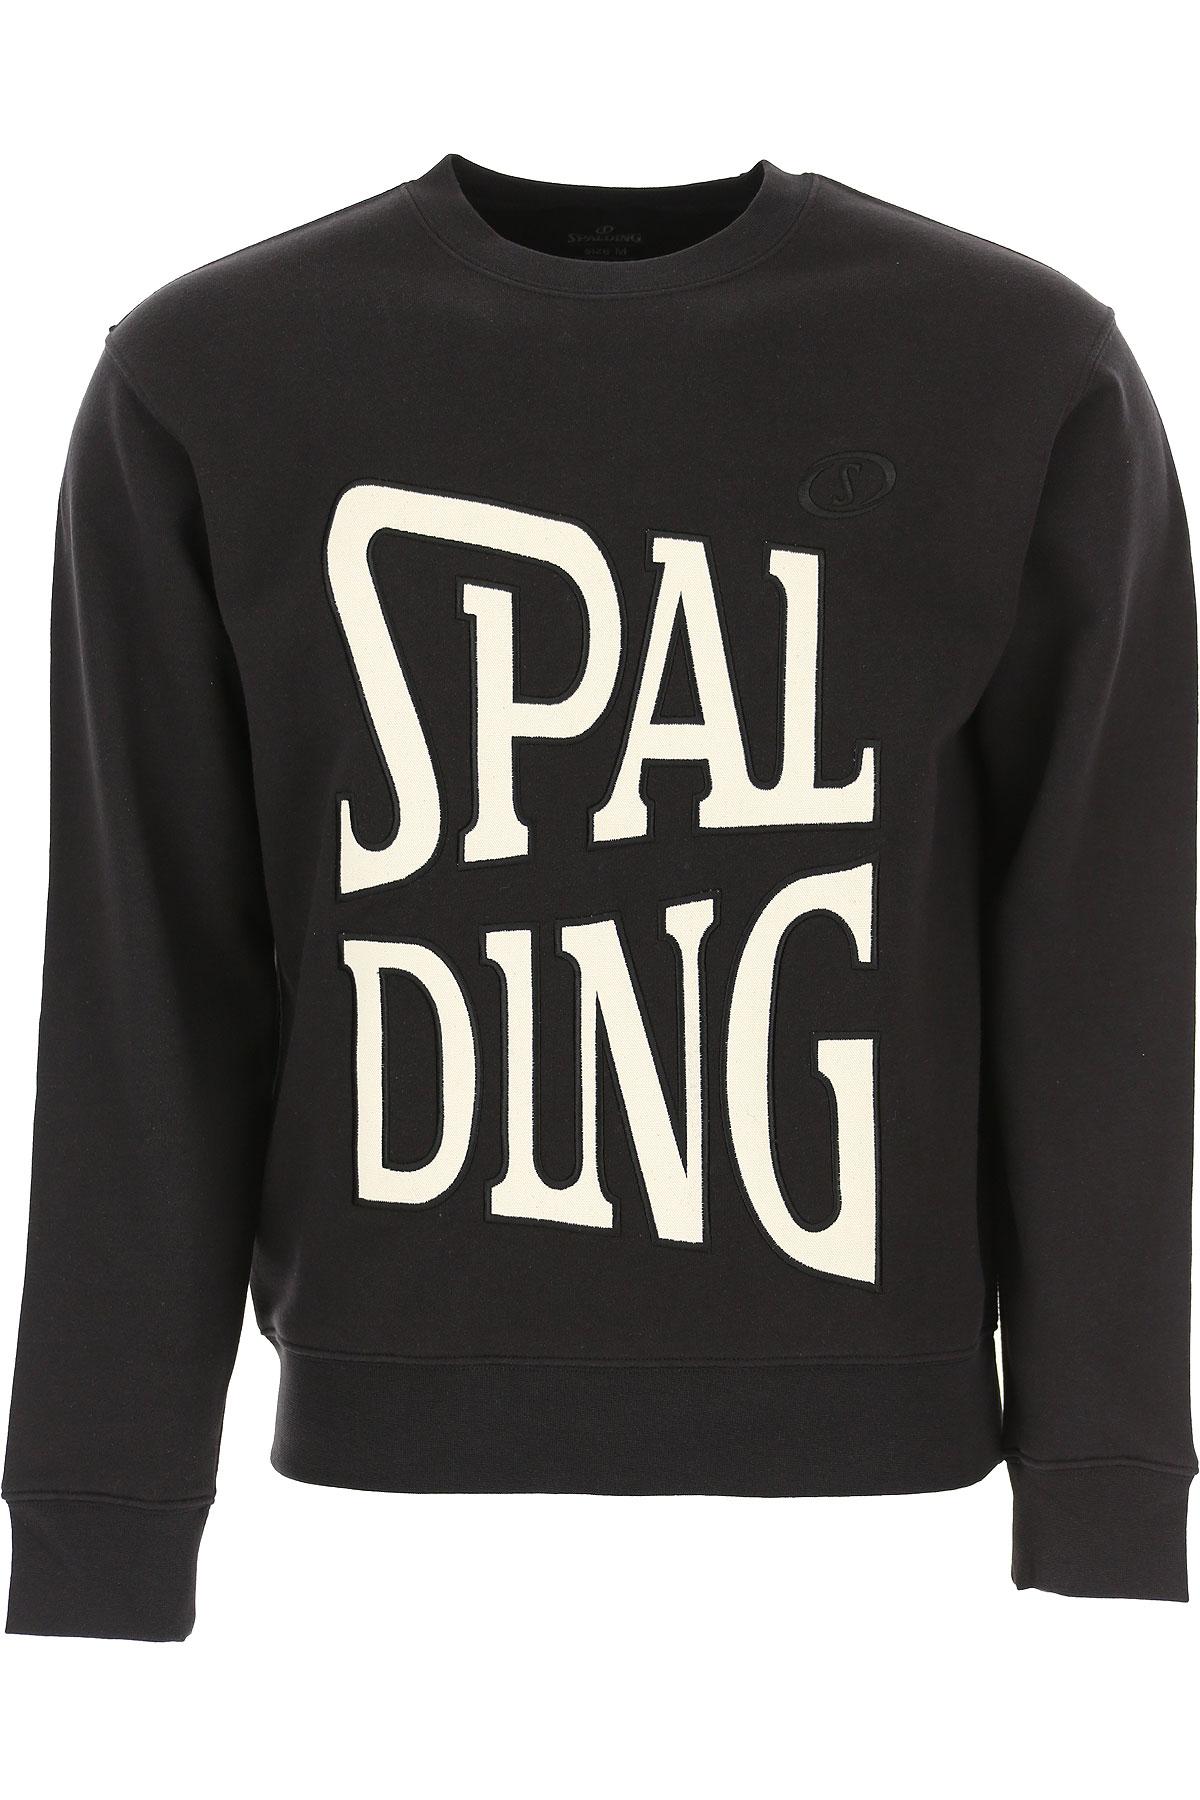 Spalding Sweatshirt for Men, Black, Cotton, 2019, M XL XXL